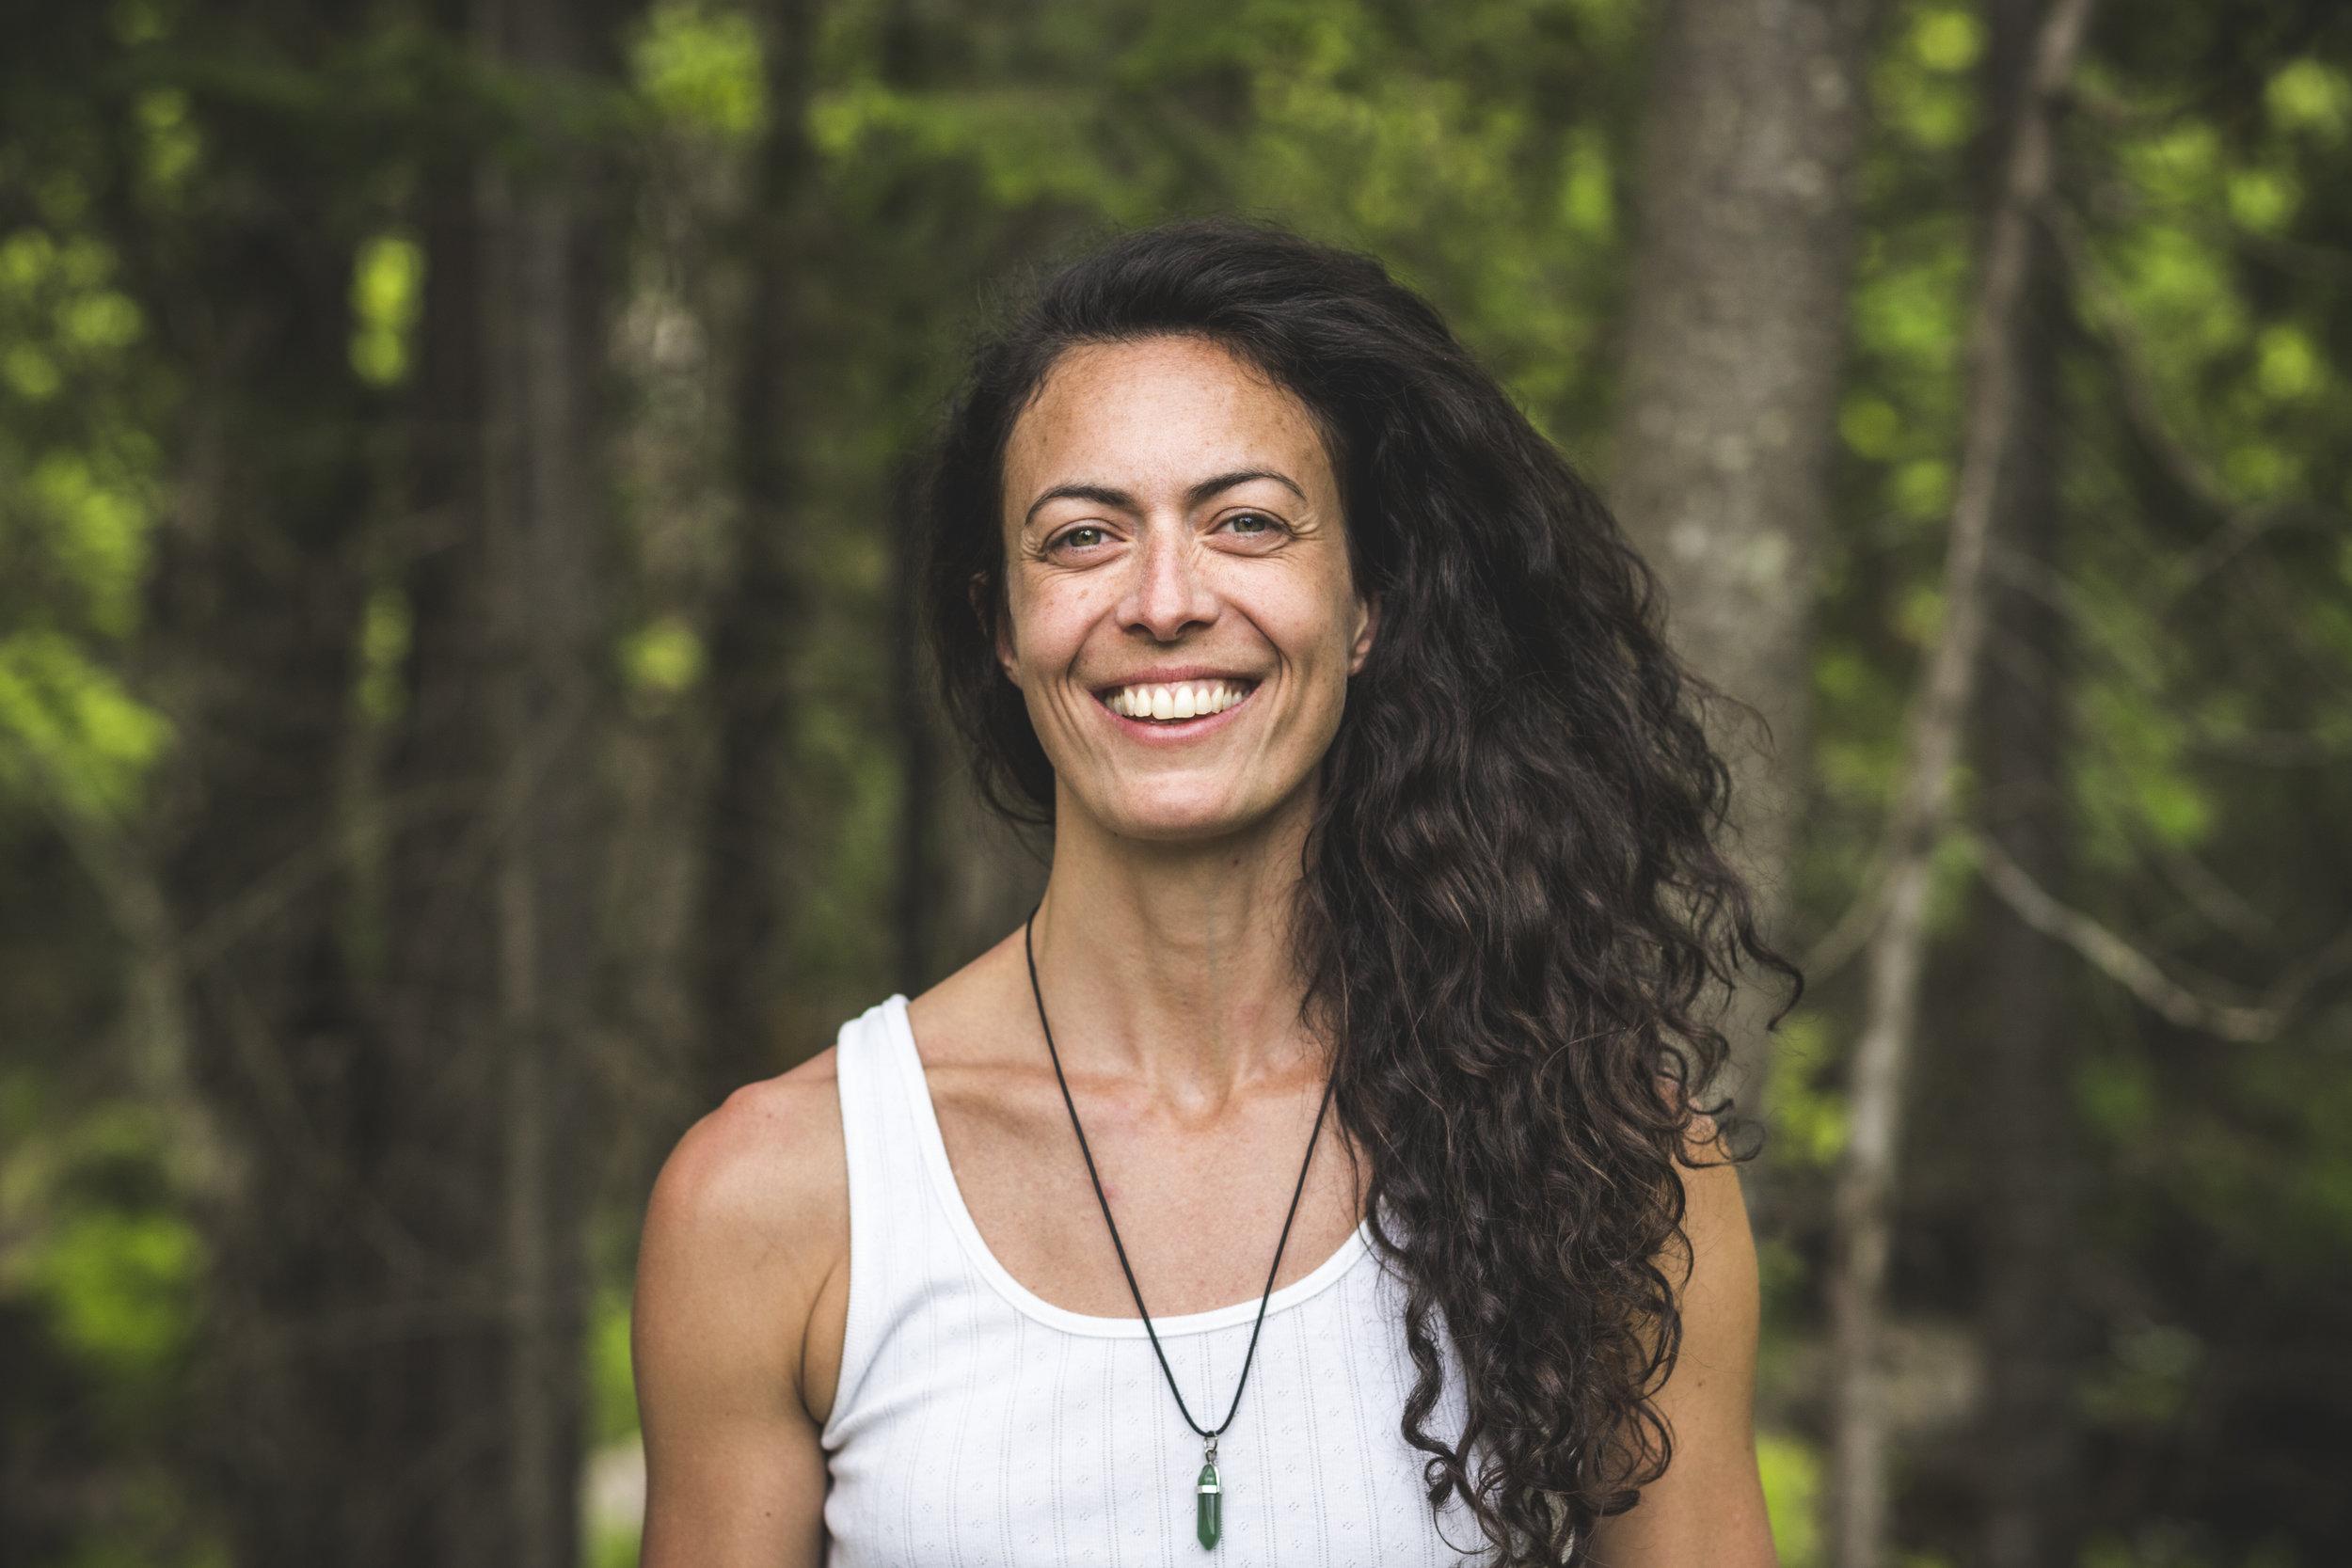 Cynthia - Bénévole joyeuse, consciencieuse & radieuse